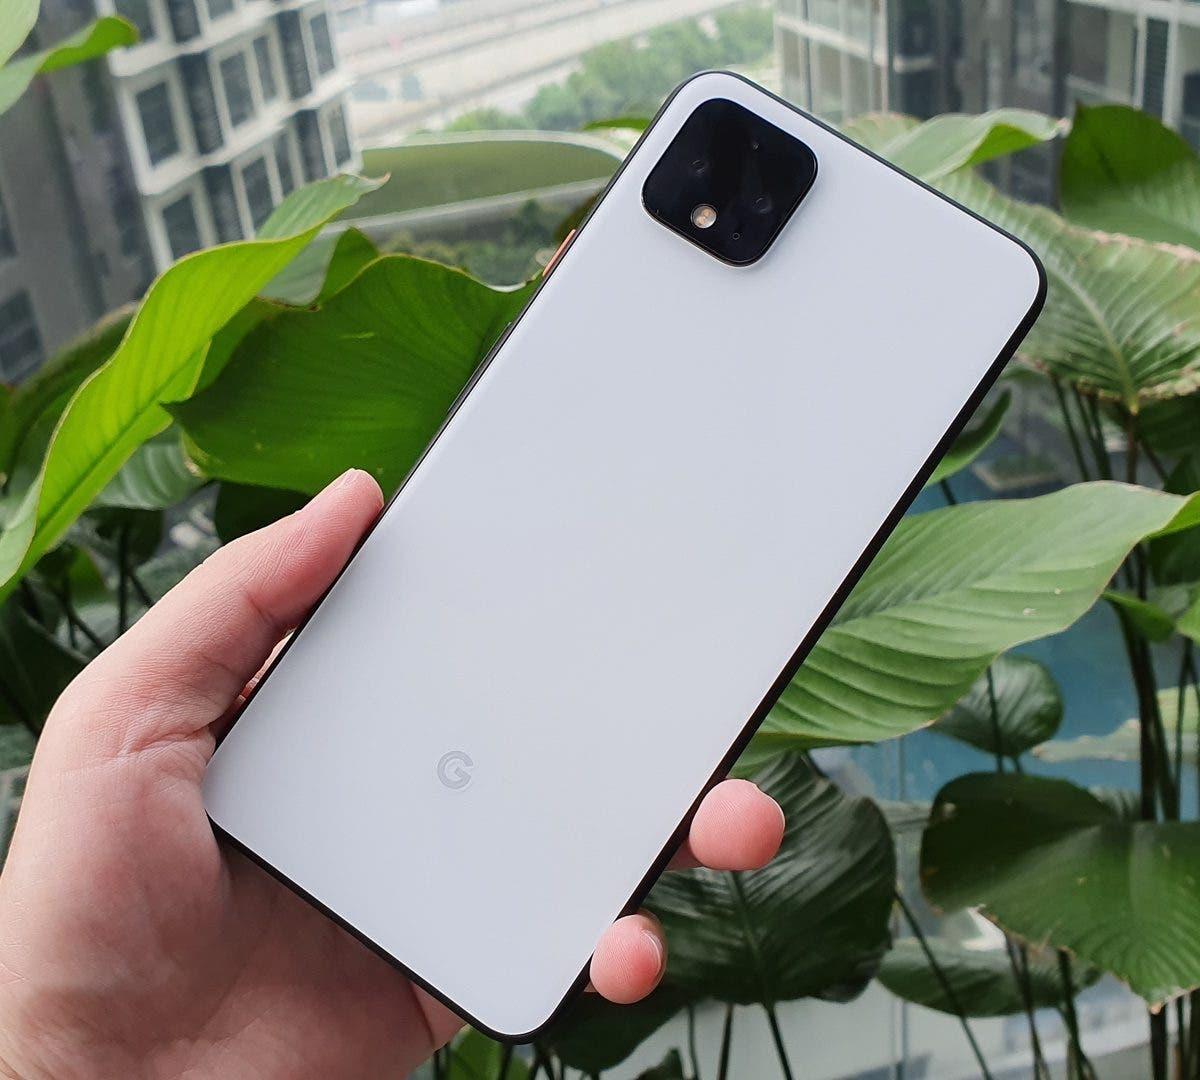 Google прекратила продажи и производство смартфонов Pixel 4 и Pixel 4 XL (google pixel 4 xl early hands on 4 1200x1080 1)